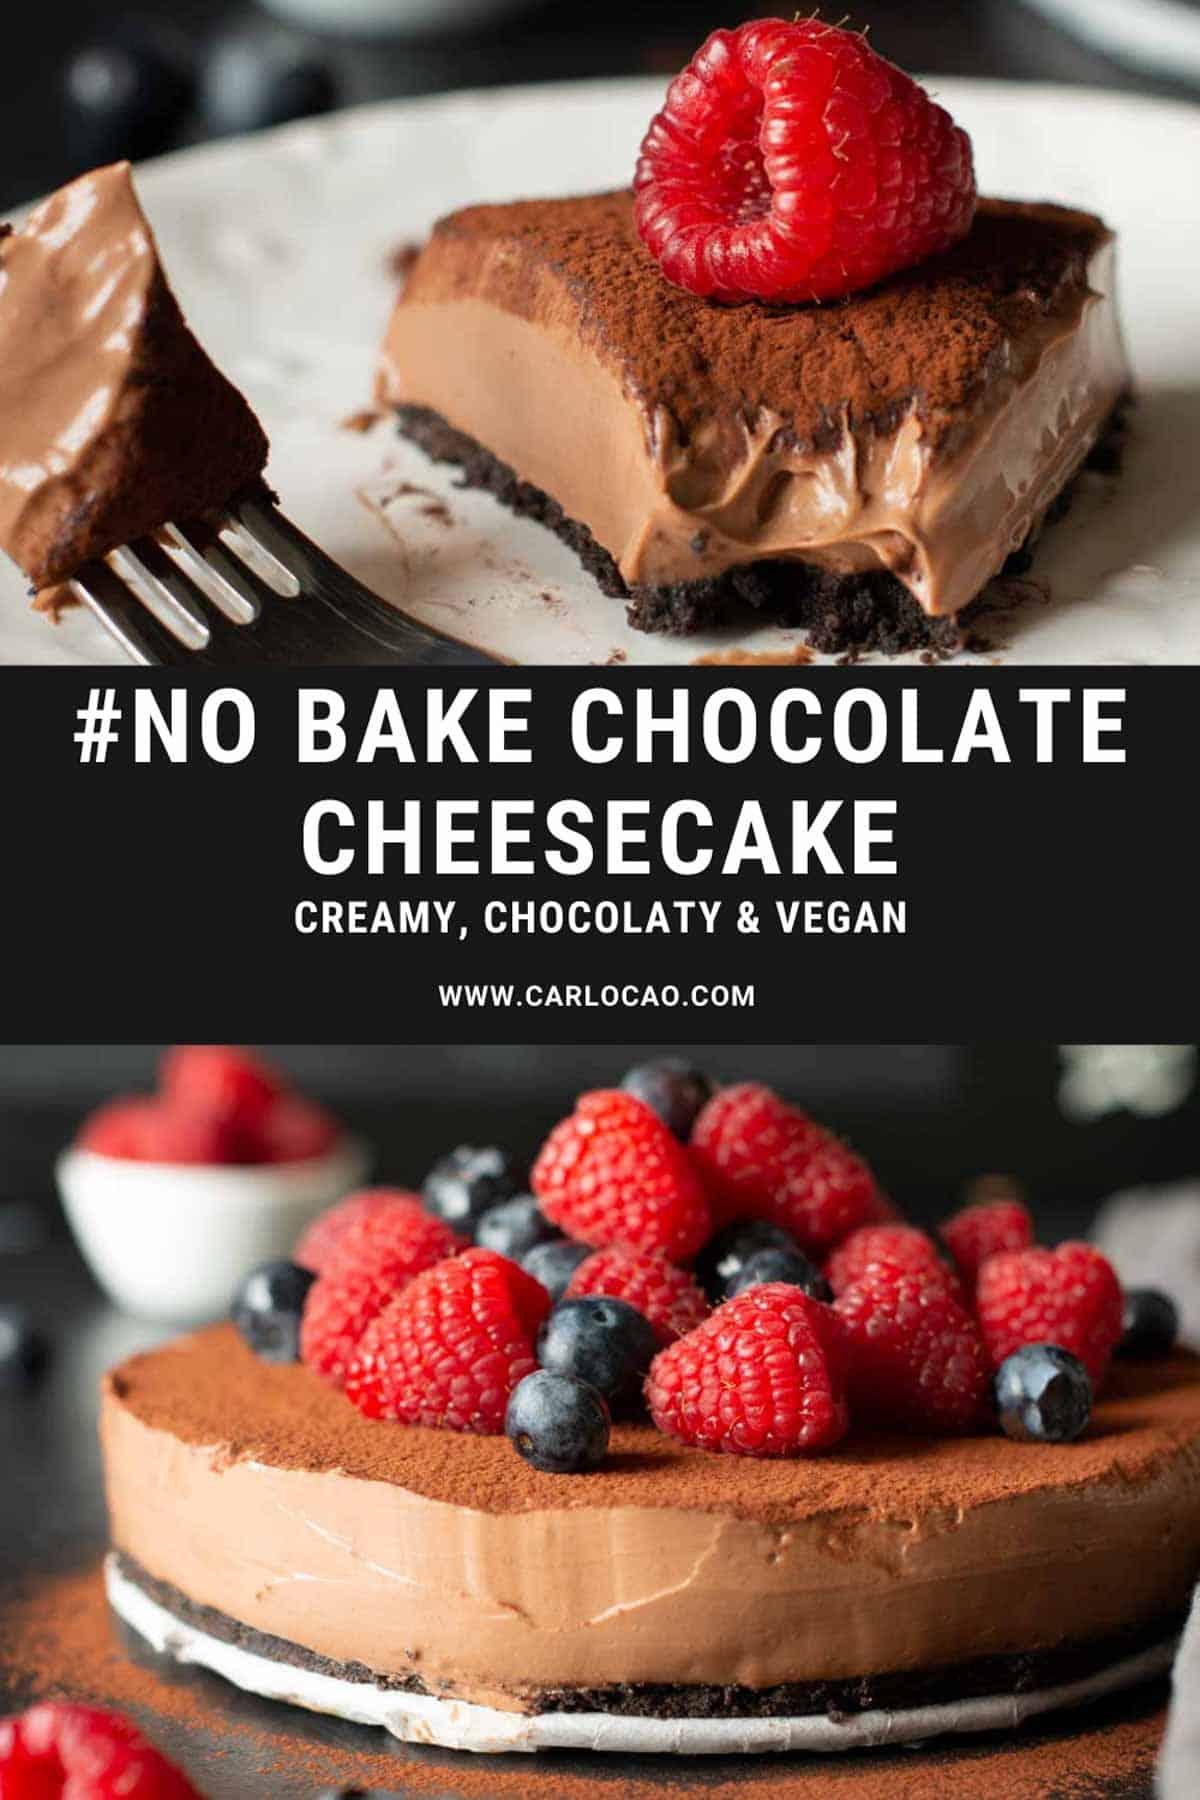 Image of no bake chocolate cheesecake